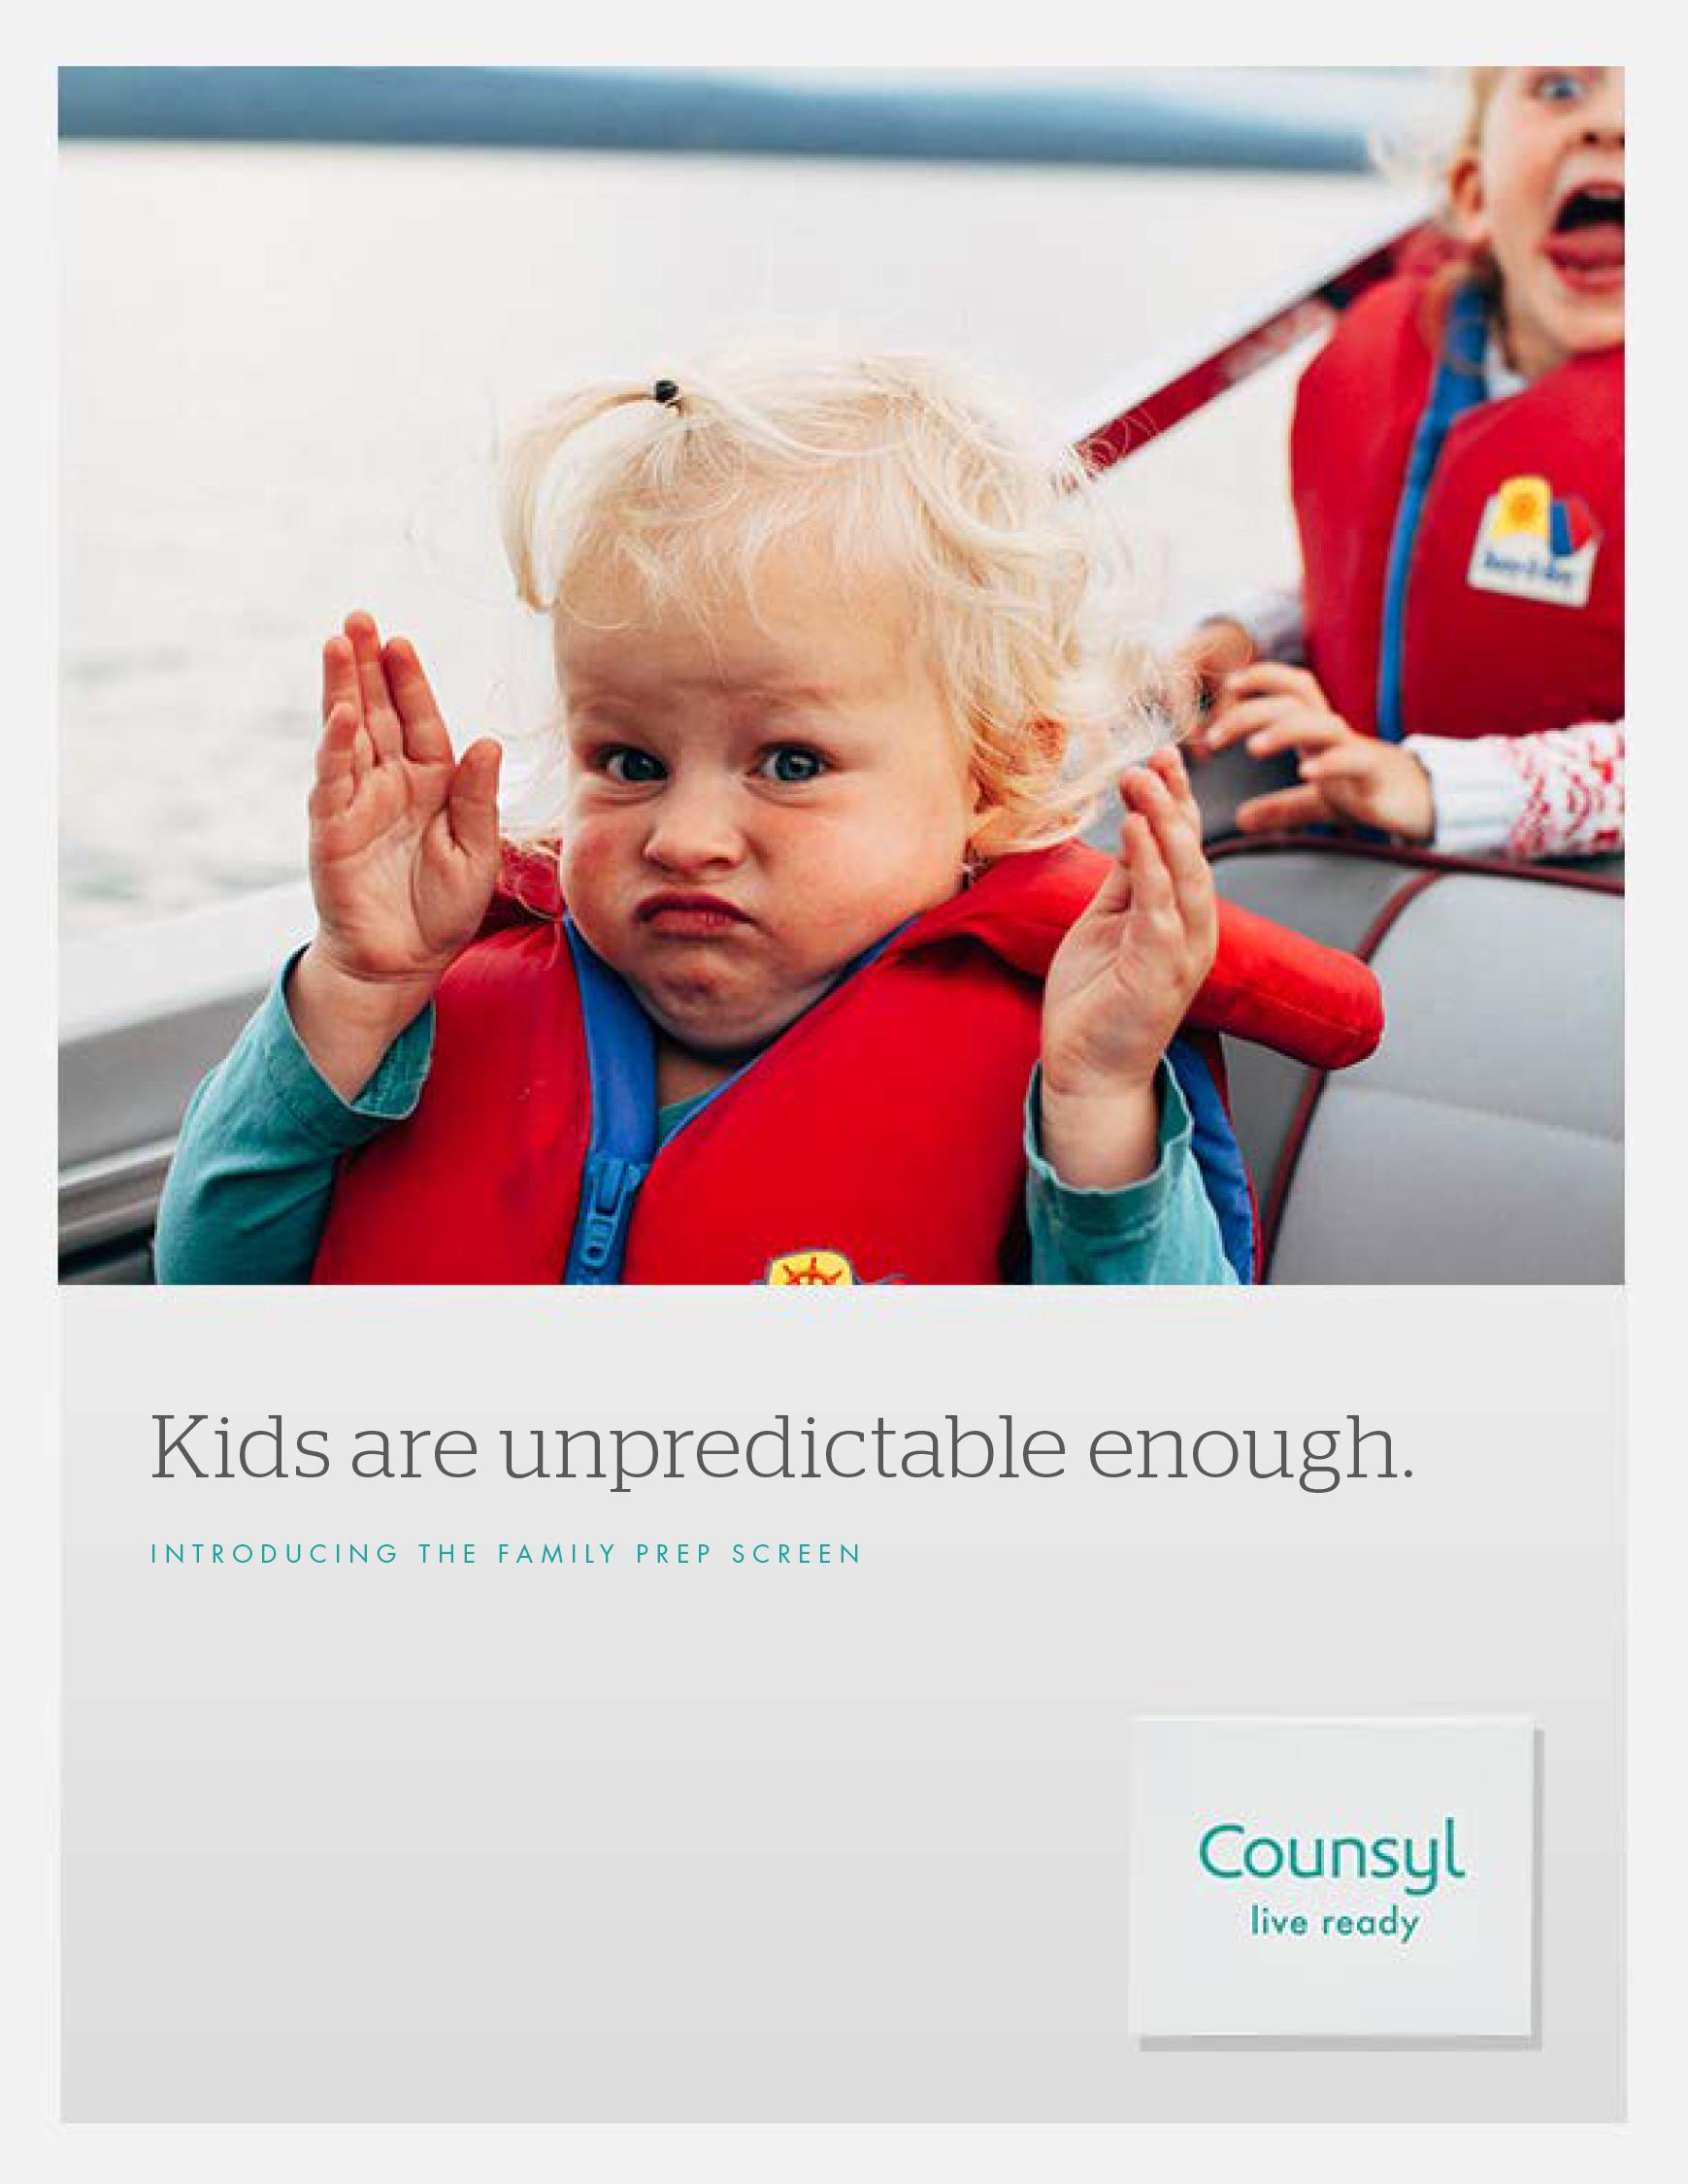 kids_ads-3.png